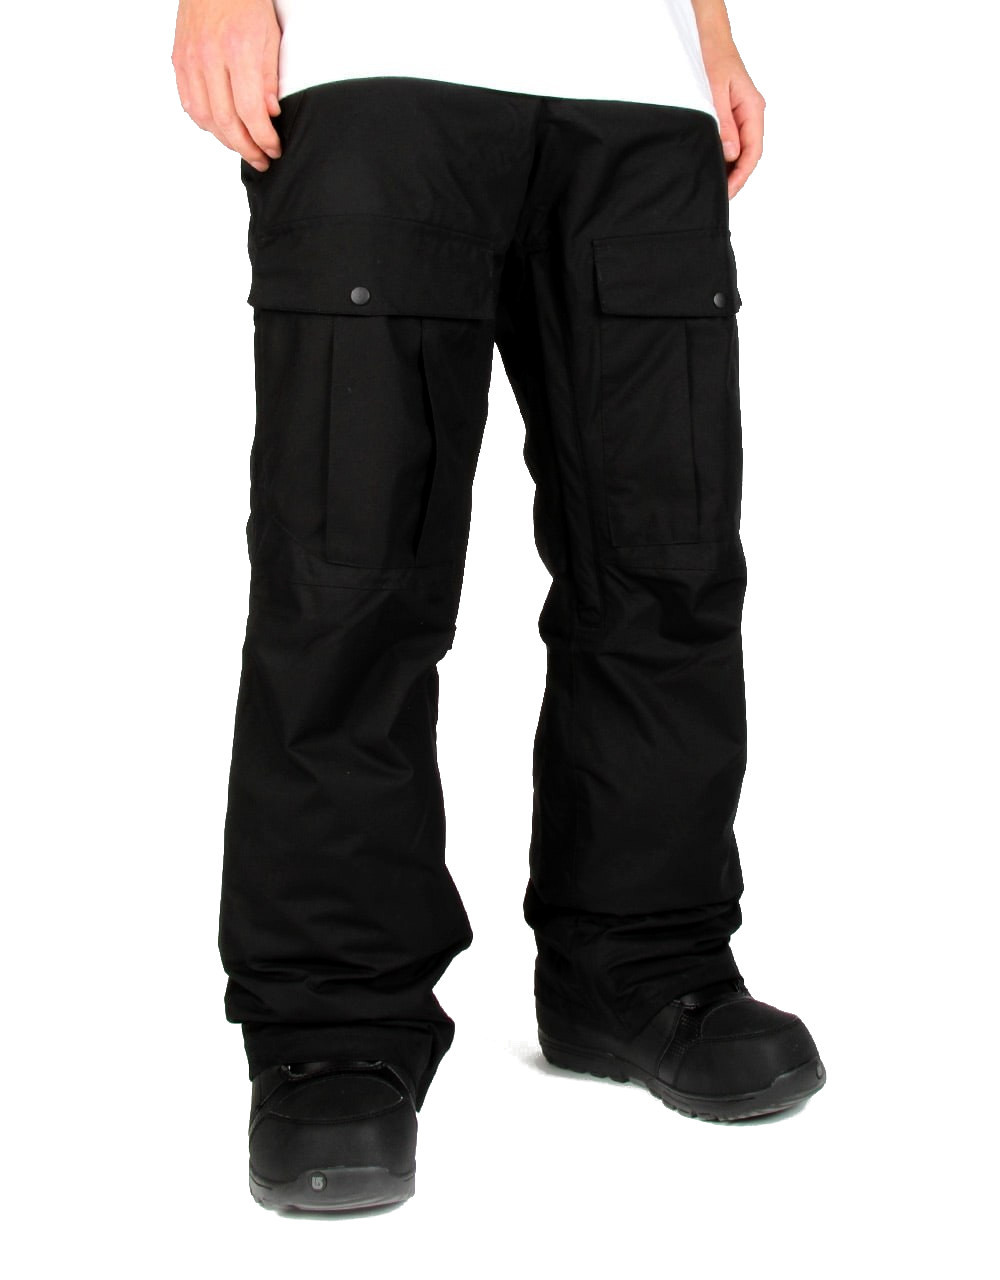 ADIDAS ORIGINALS GREELEY INSULATED SNOWBOARD PANTS